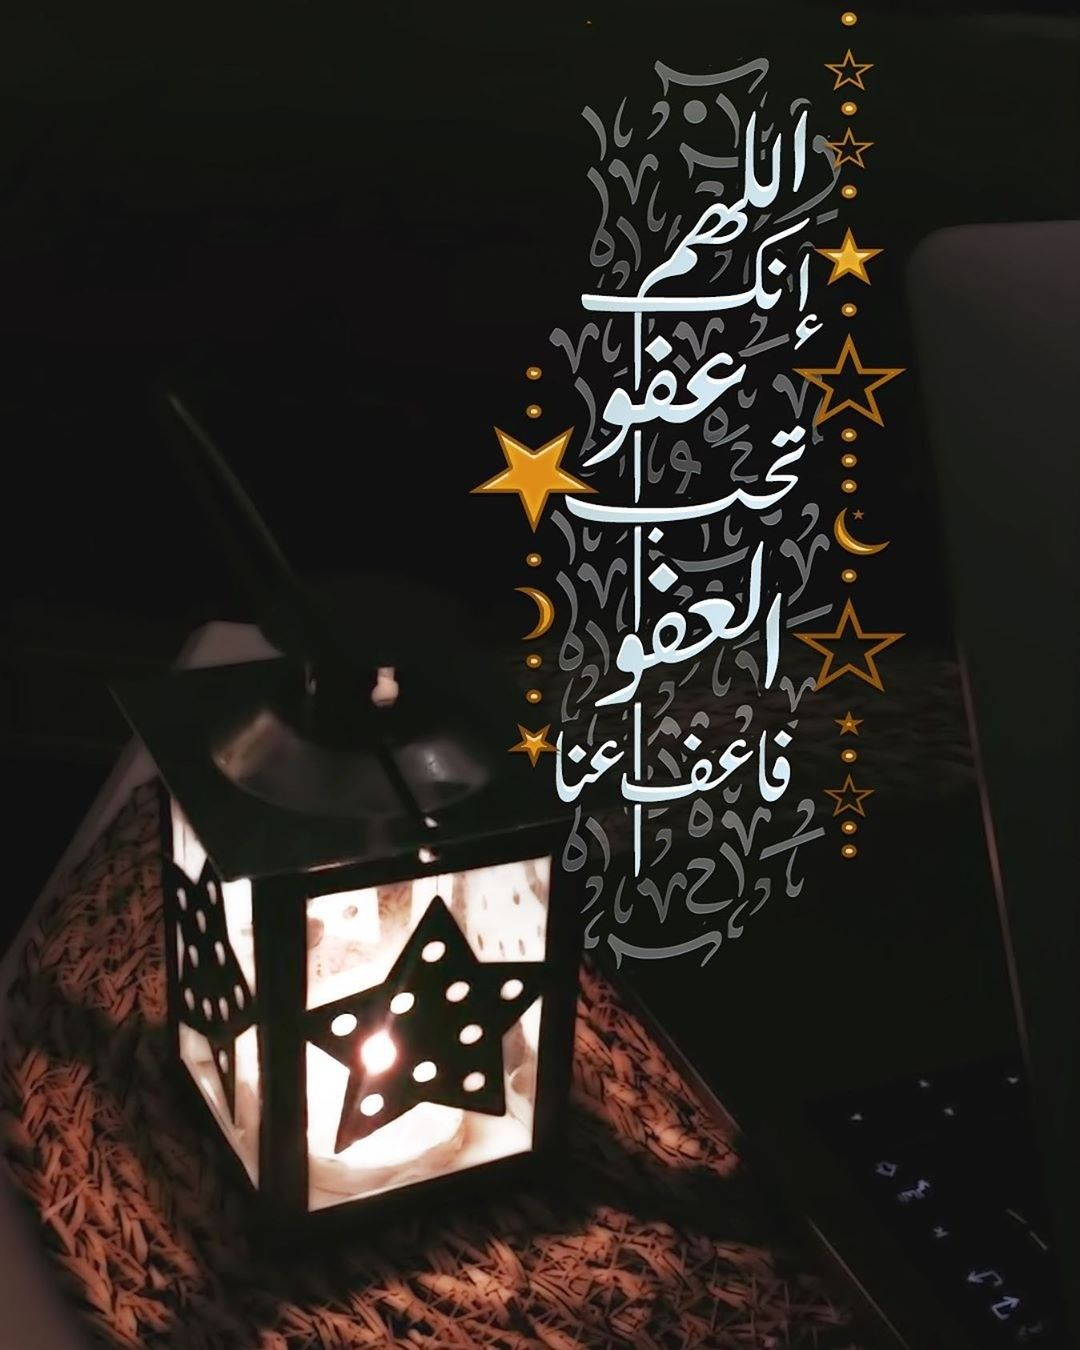 Pin by عبق الورد on أدعيه وأذكار in 2020 Quran wallpaper